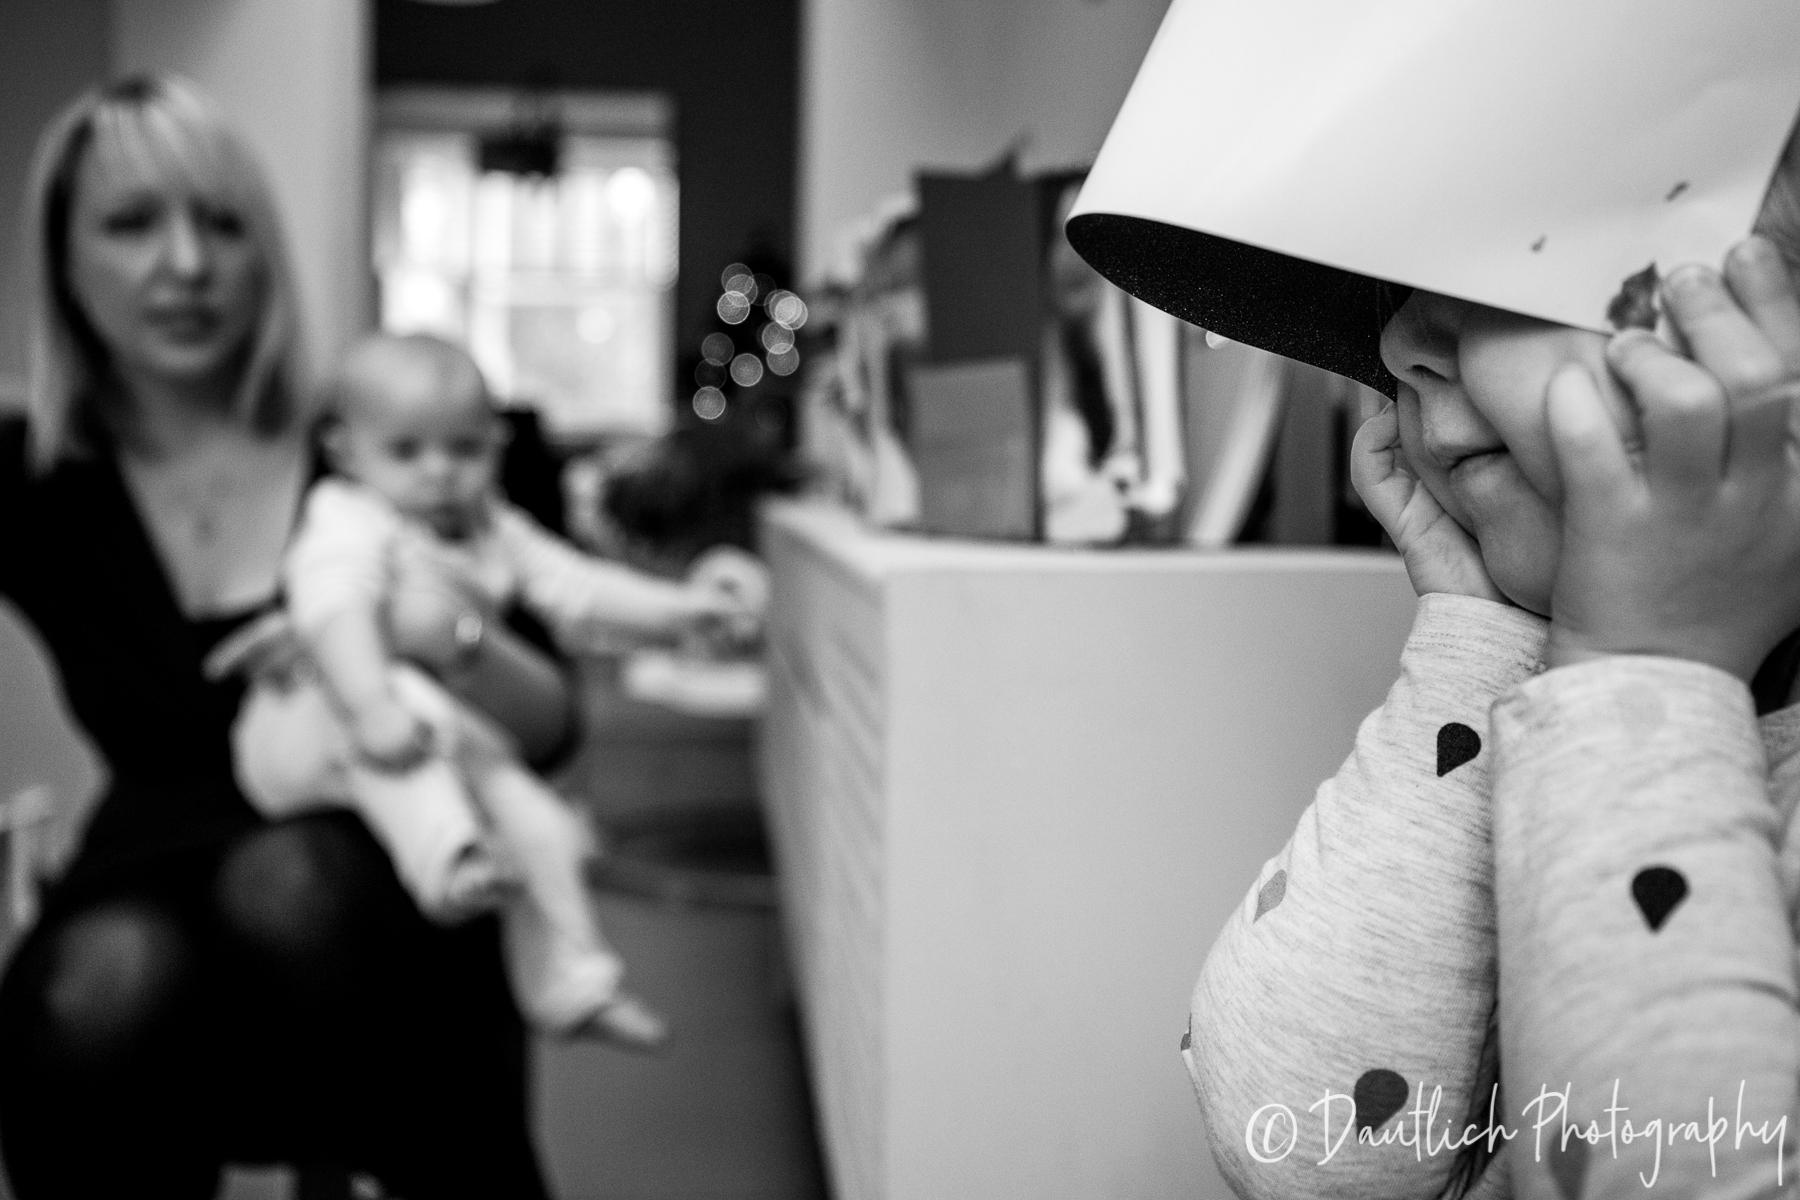 Dautlich_Photography_Apostolov_reedit-16.jpg